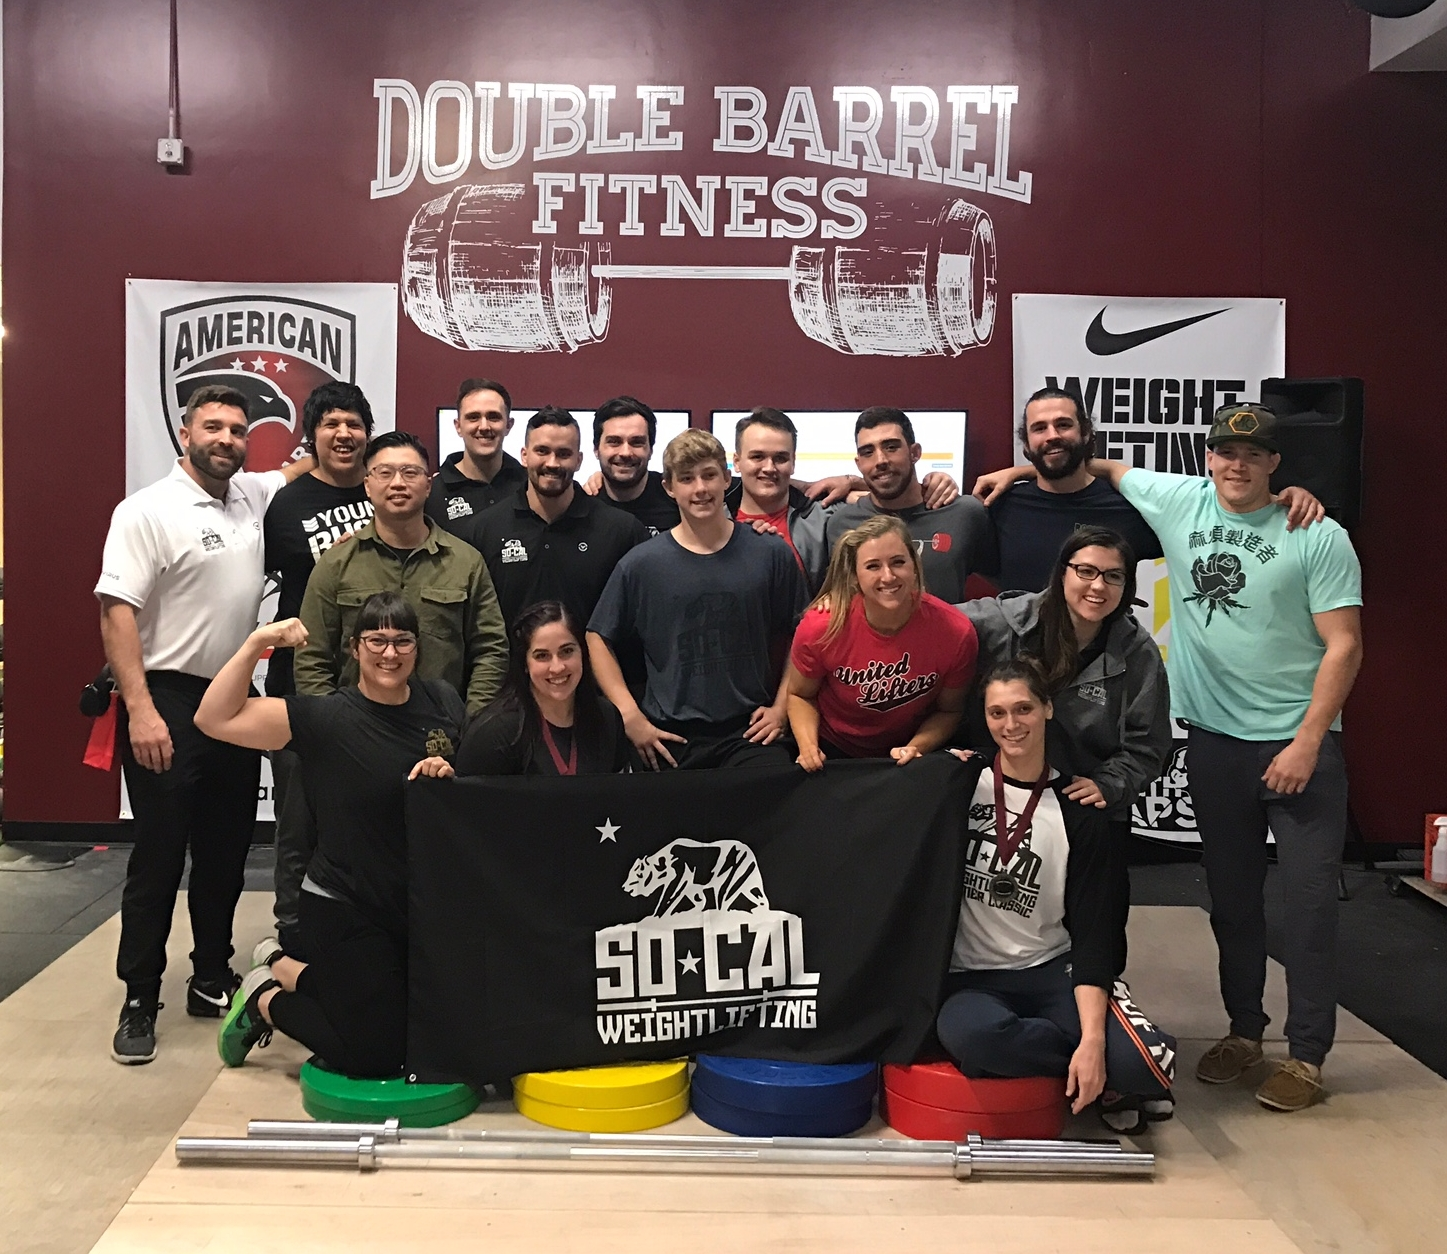 SoCal winning Best Team and Best Women's Team at the 2018 Double Barrel Open Weightlifting Meet